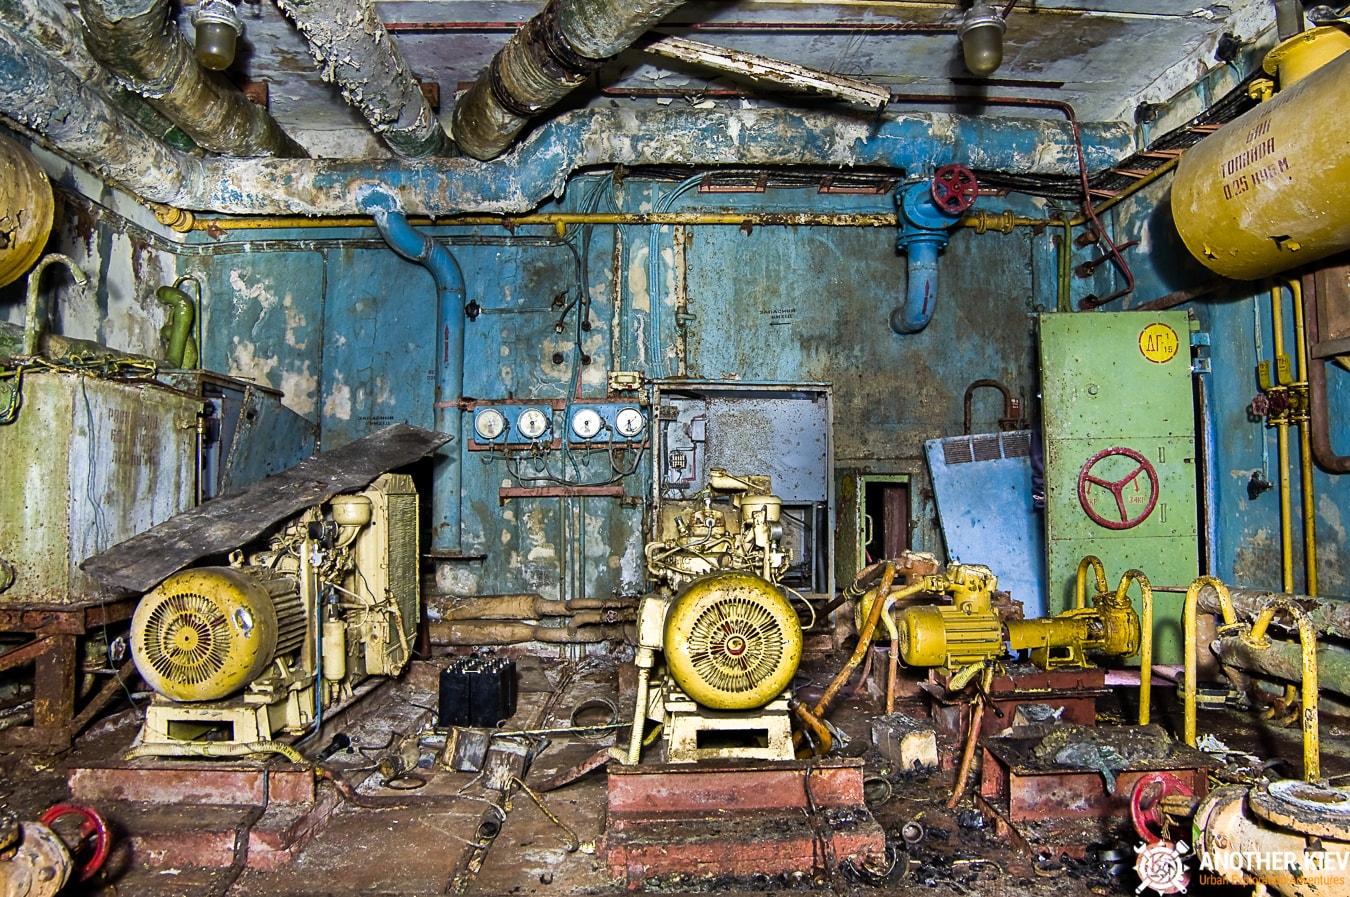 exploring-nuclear-bunker-duga-312 HIDDEN CHERNOBYL: EXPLORING NUCLEAR BUNKER  OF DUGA-3 RADAR STATION